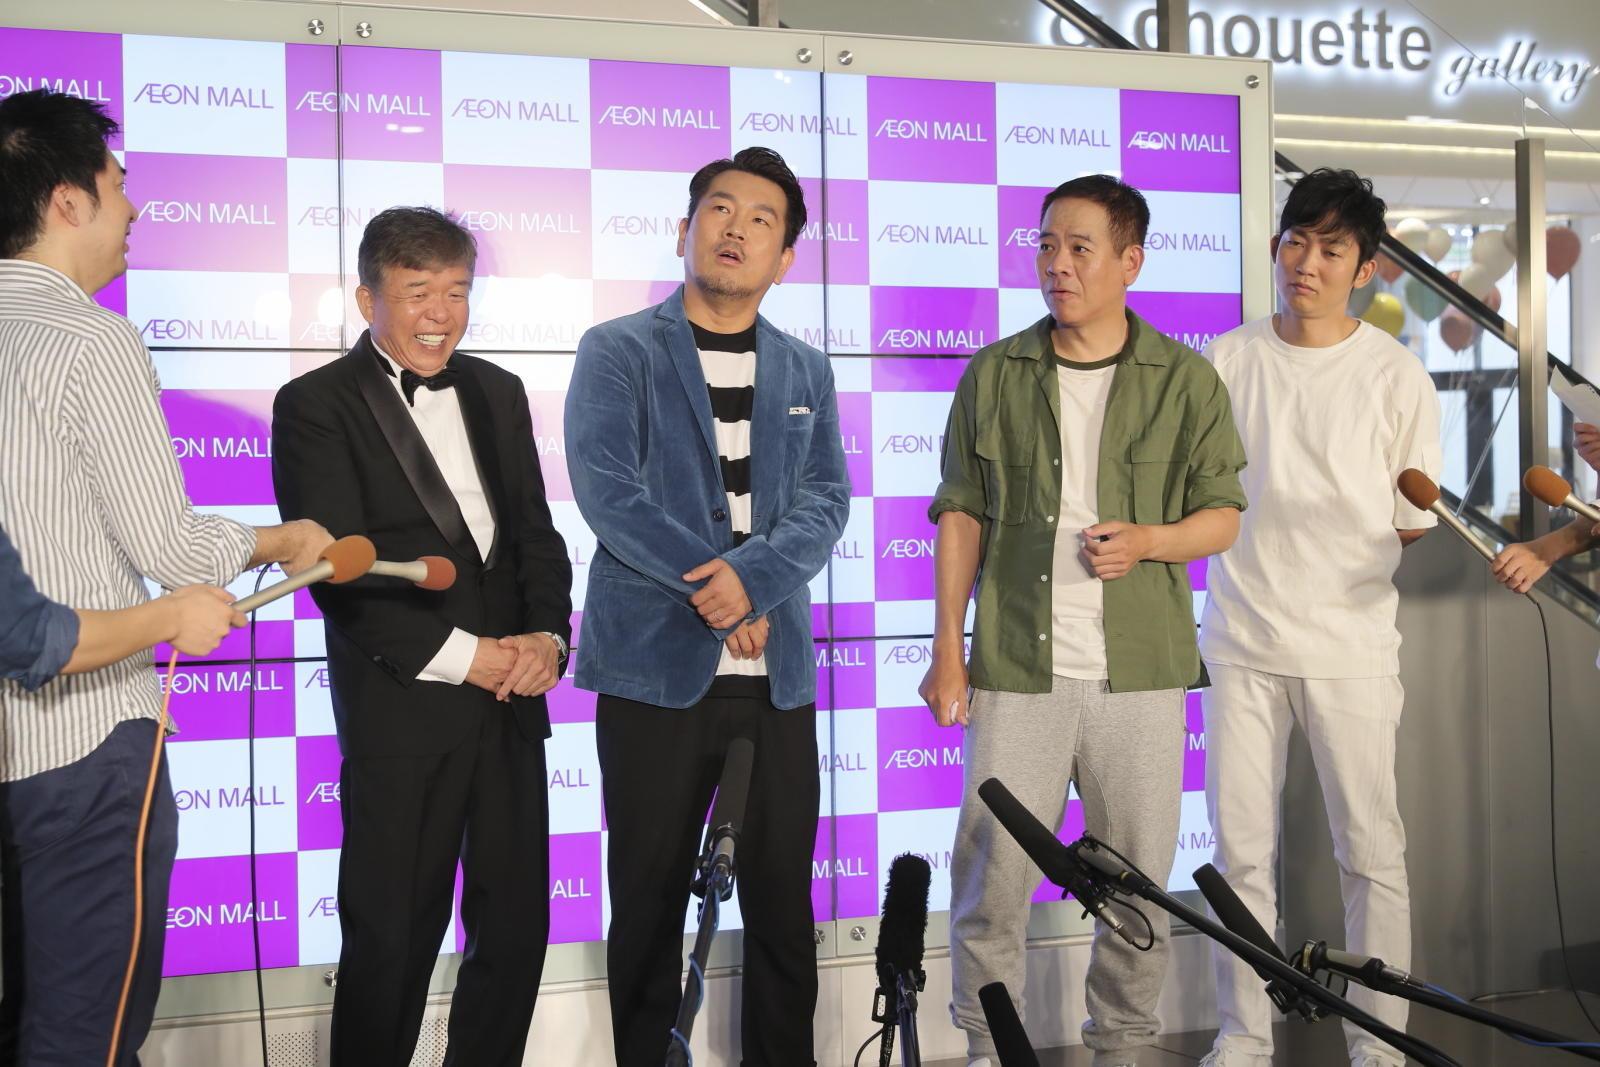 http://news.yoshimoto.co.jp/20170908235129-303c0e2bba22669009ddd76bad2b7ce51f1b9cbd.jpg